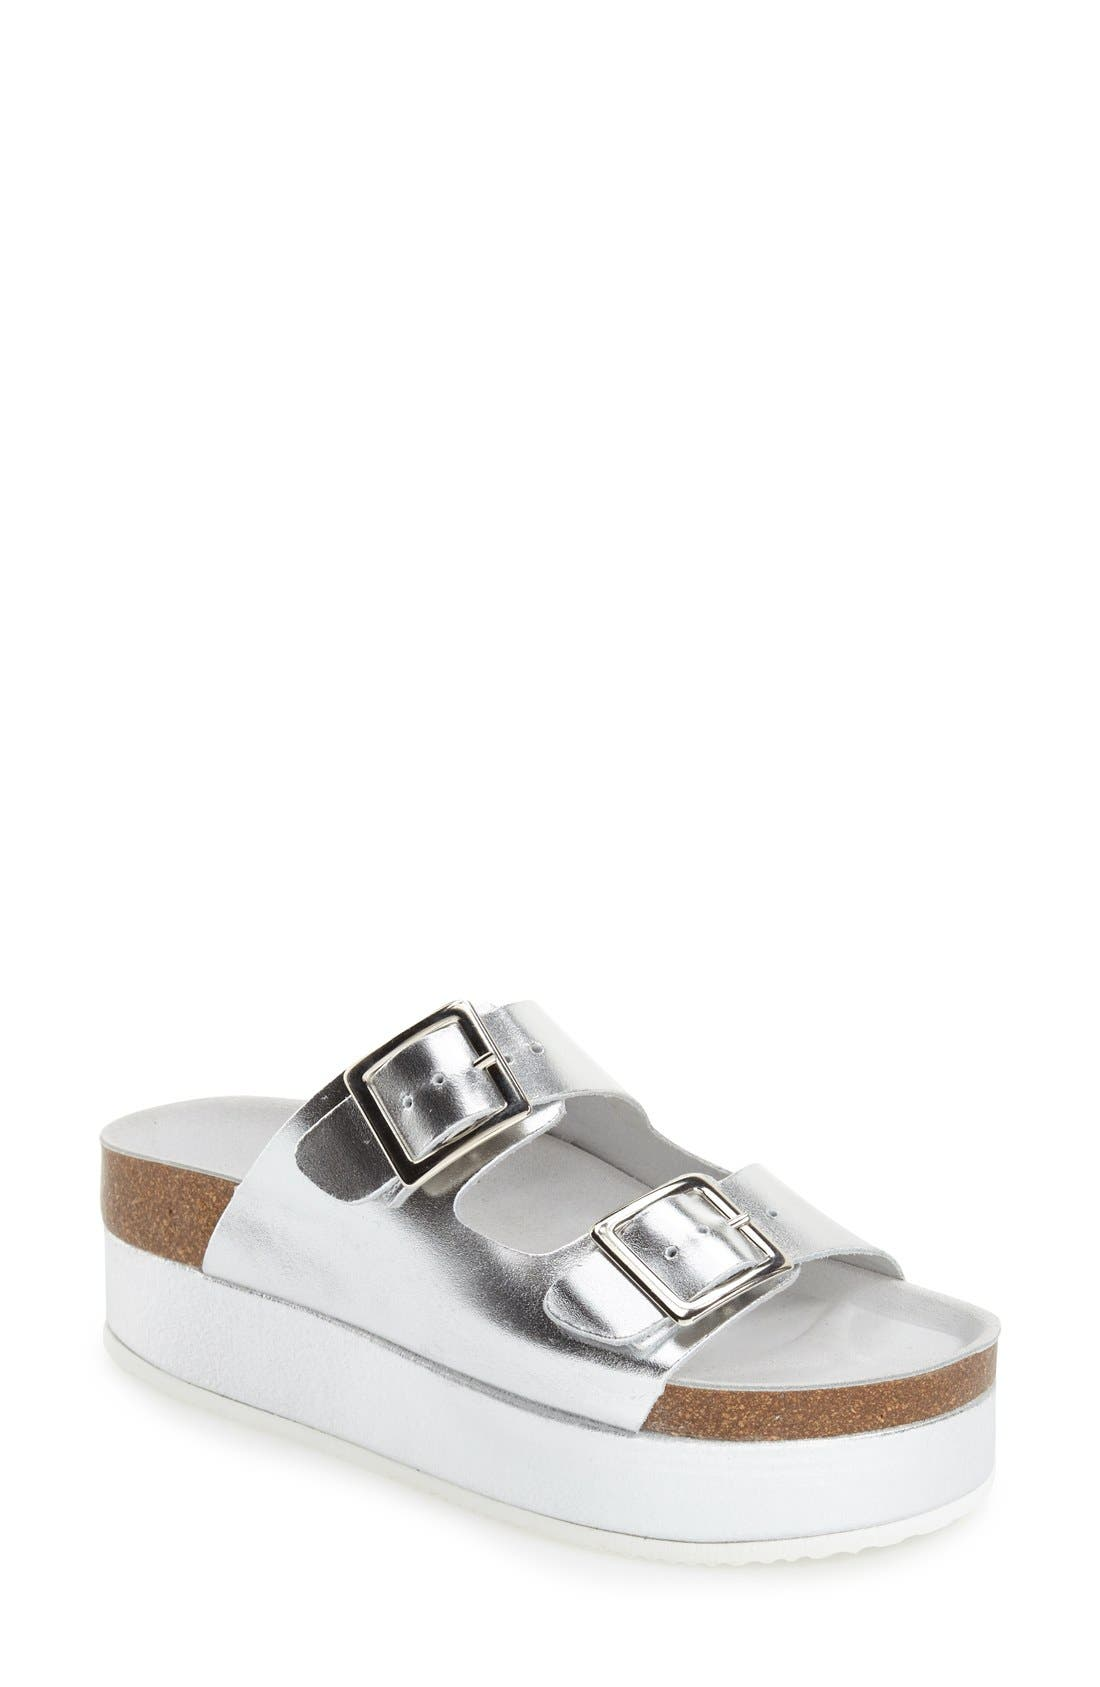 Main Image - Topshop 'Fang' Platform Sandal (Women)